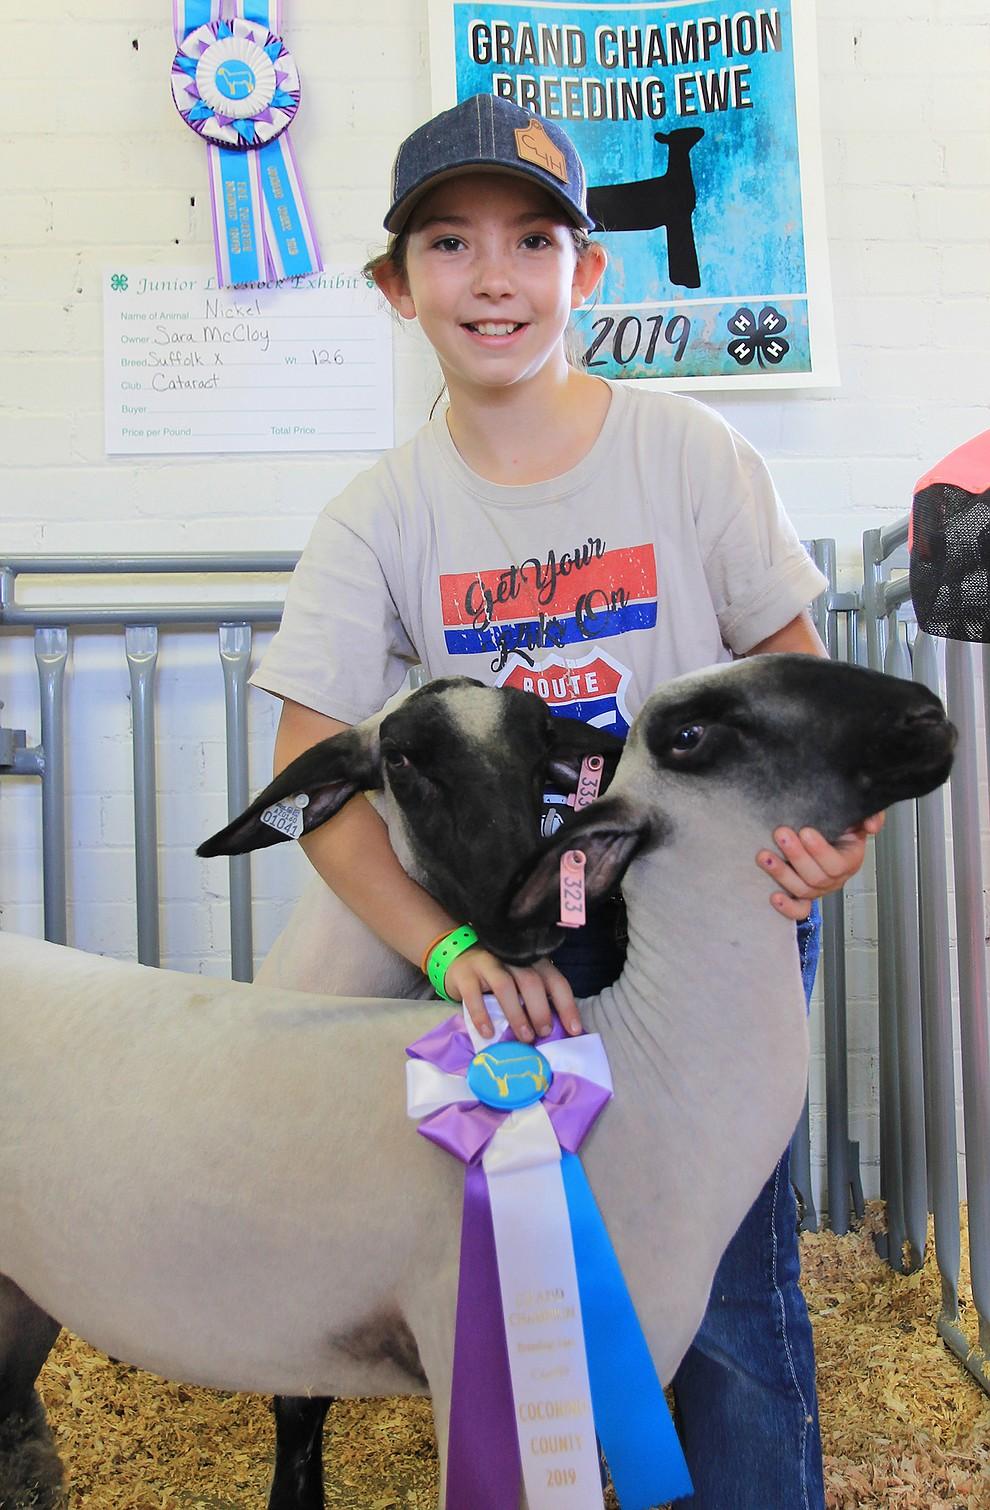 Sara McCloy was Grand Champion Breeding Ewe. (Wendy Howell/WGCN)